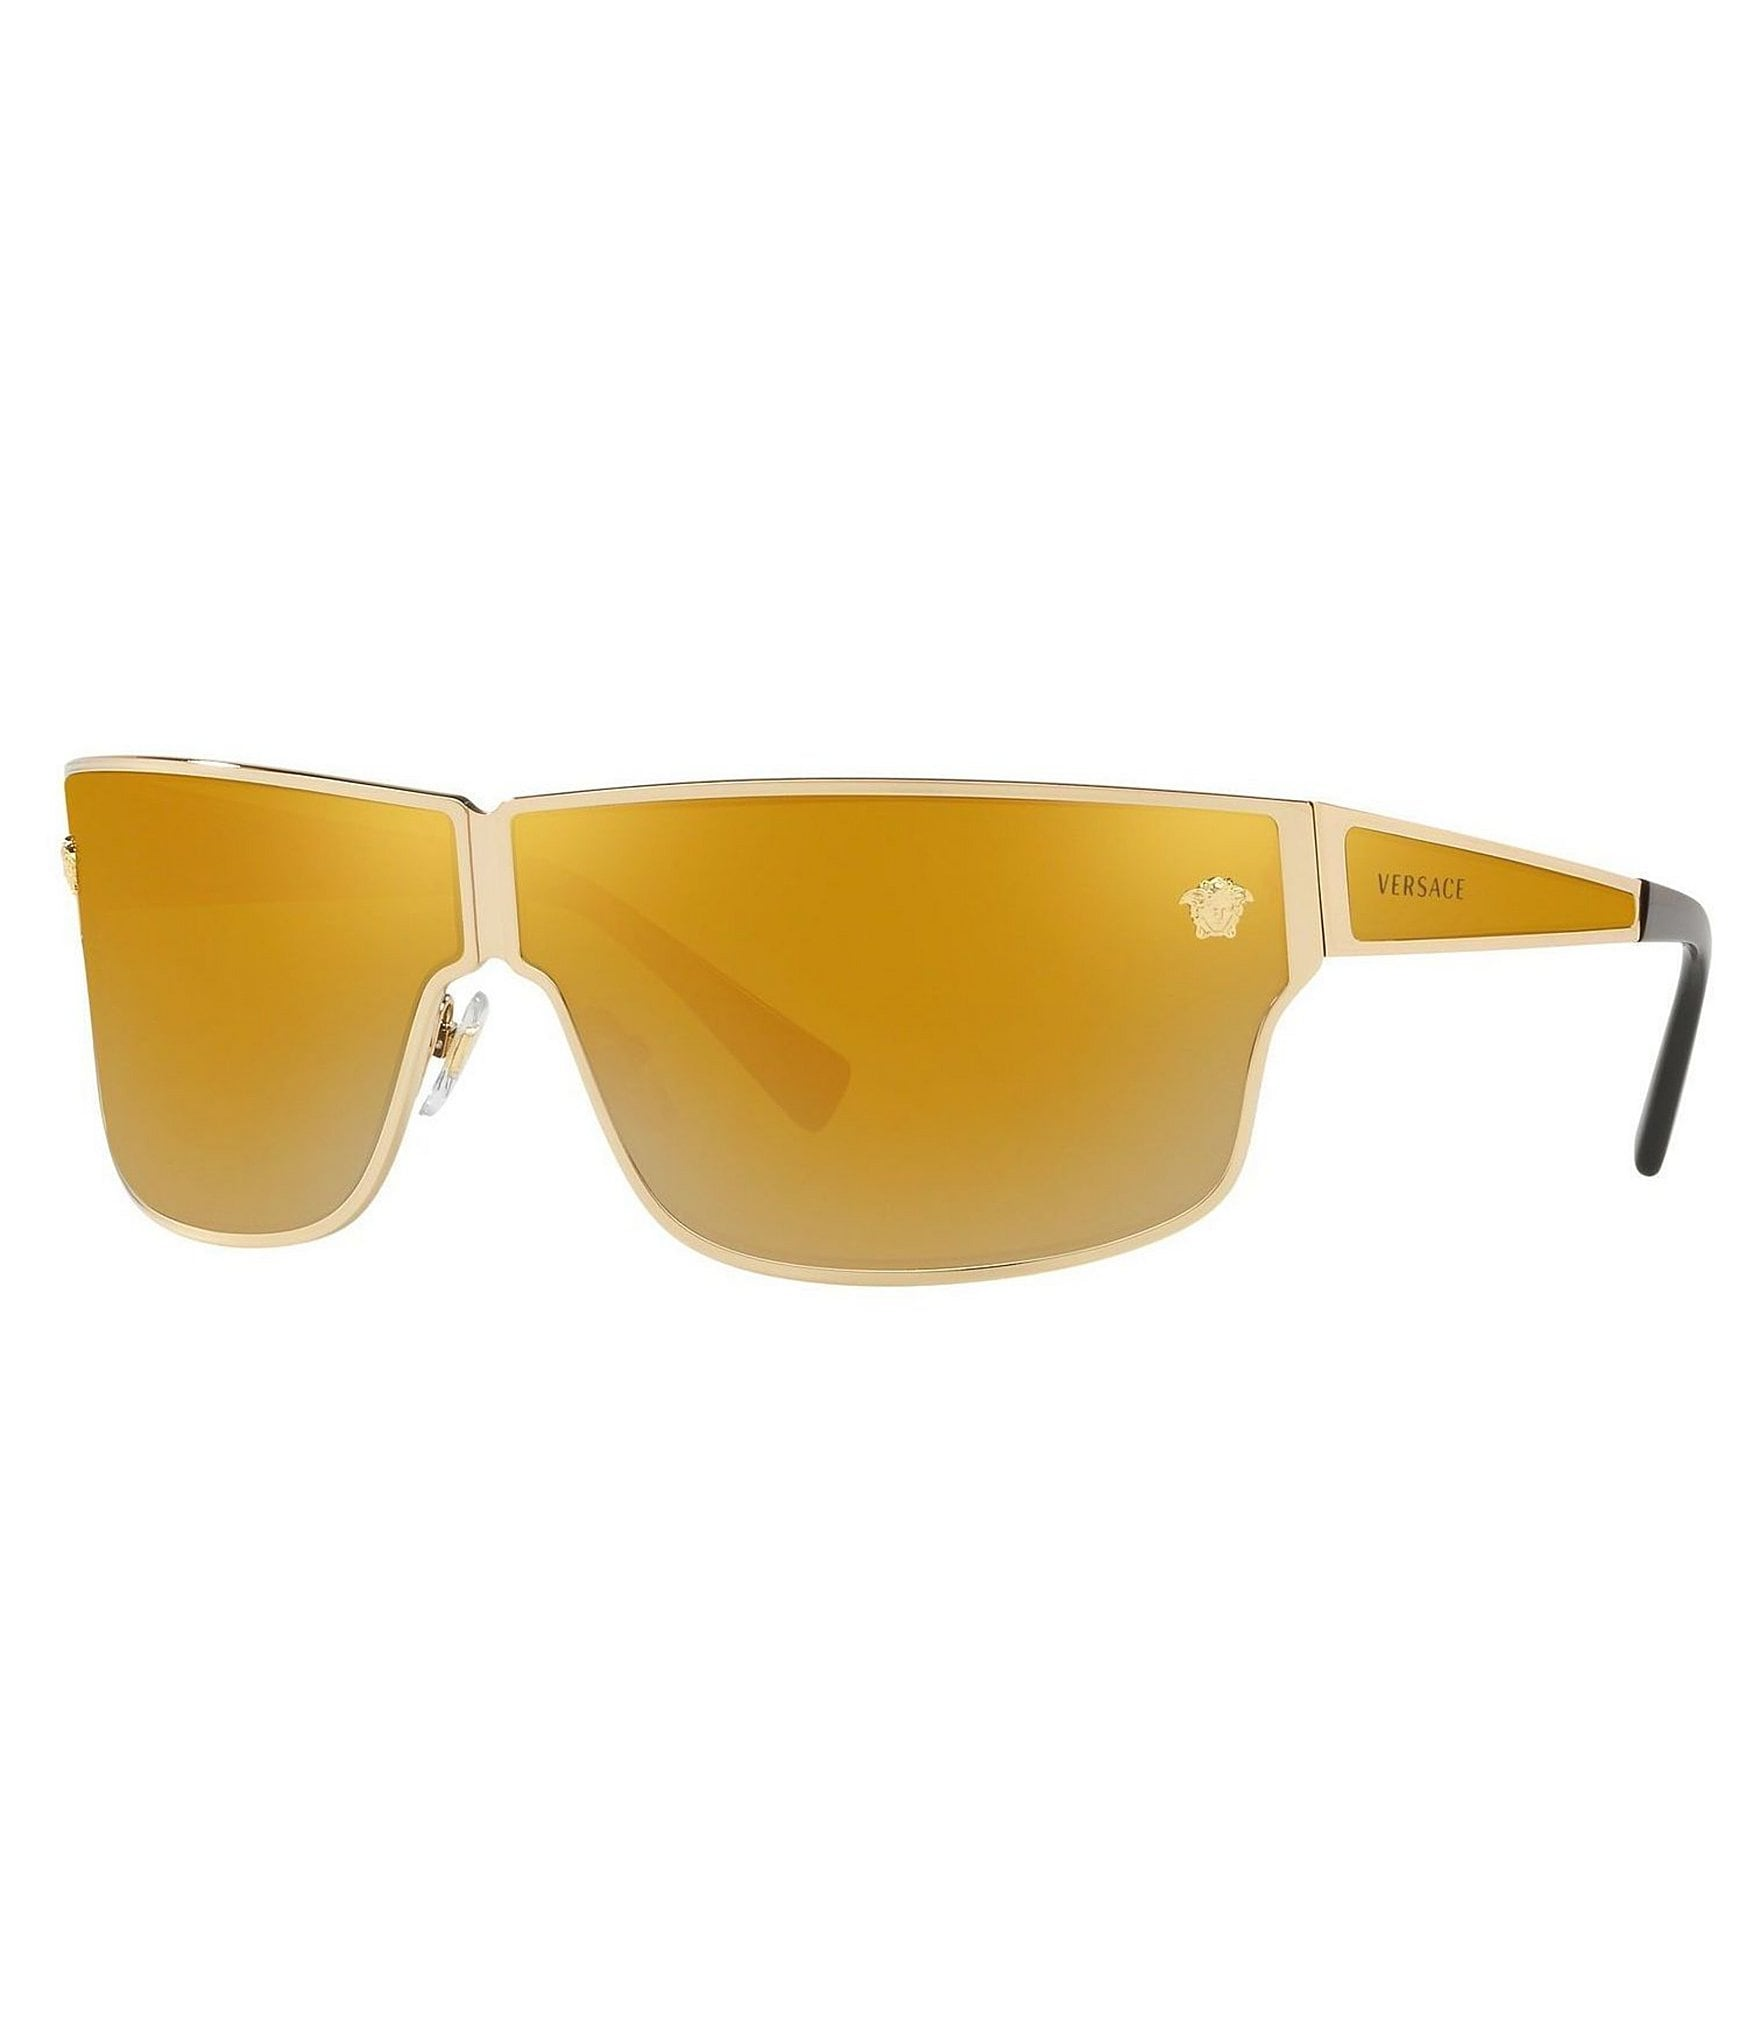 Versace Sunglasses & Eyewear | Dillard\'s